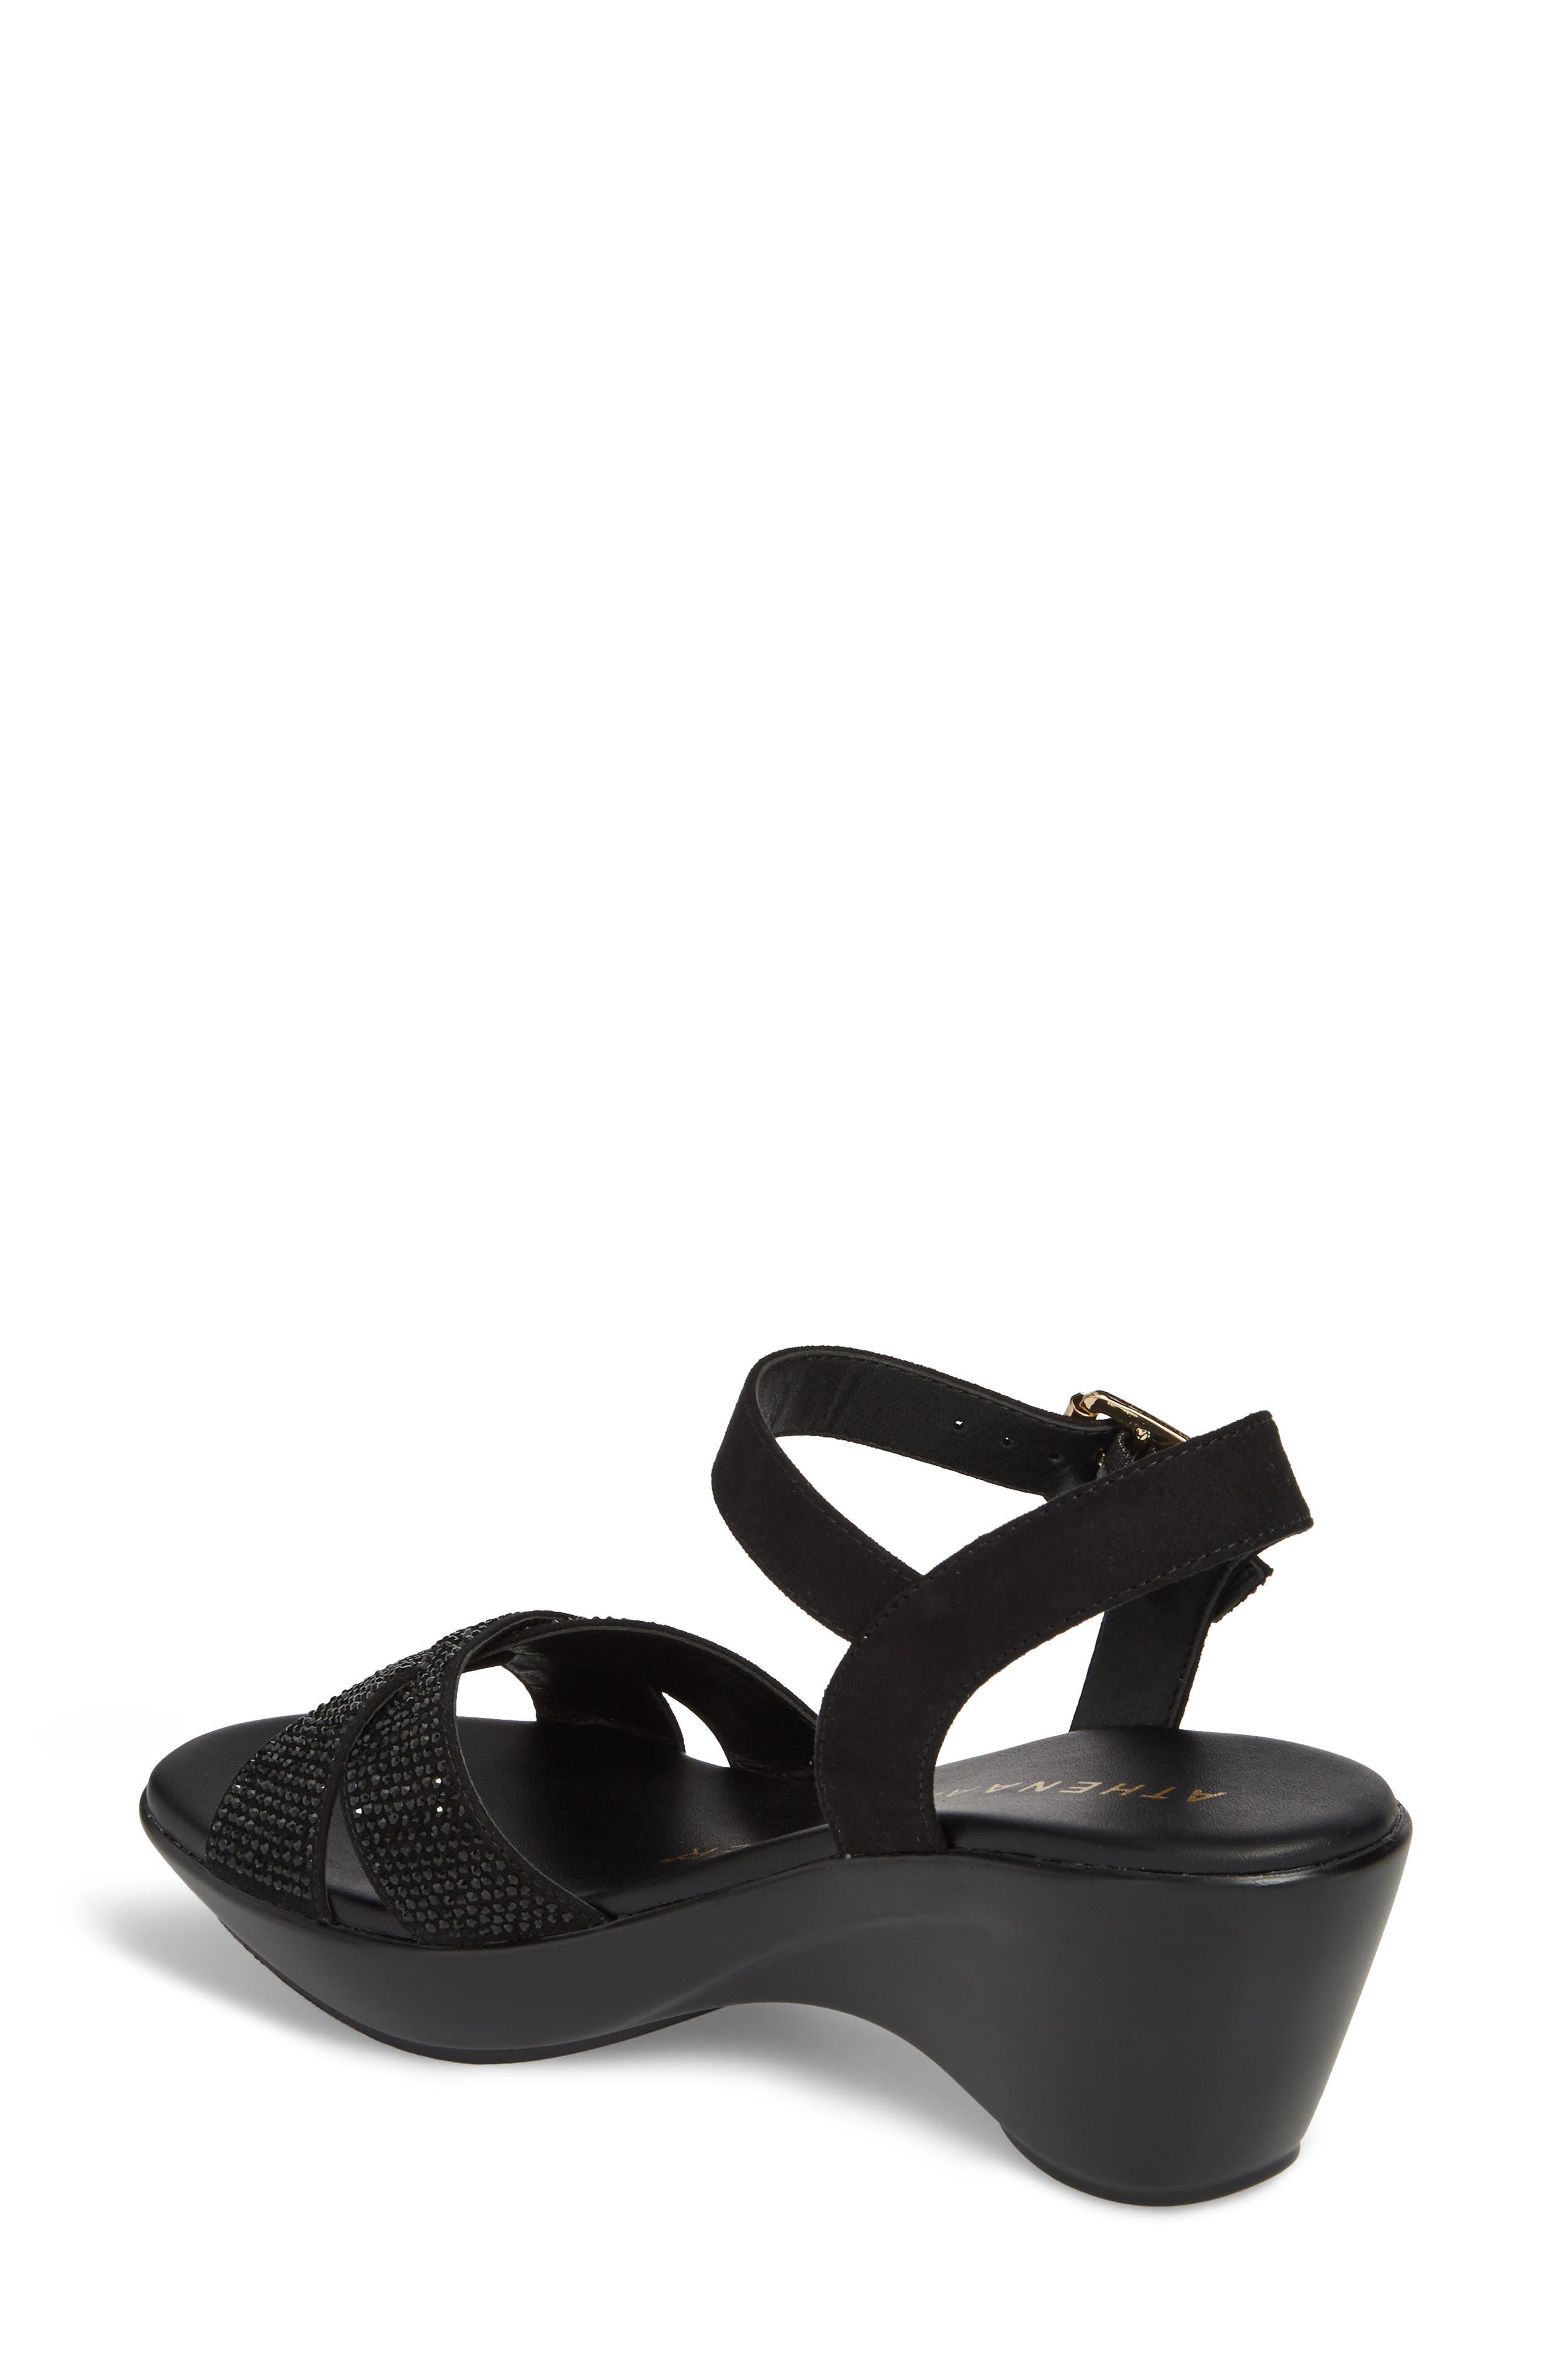 Florence Wedge Sandal,                             Alternate thumbnail 2, color,                             BLACK FAUX SUEDE